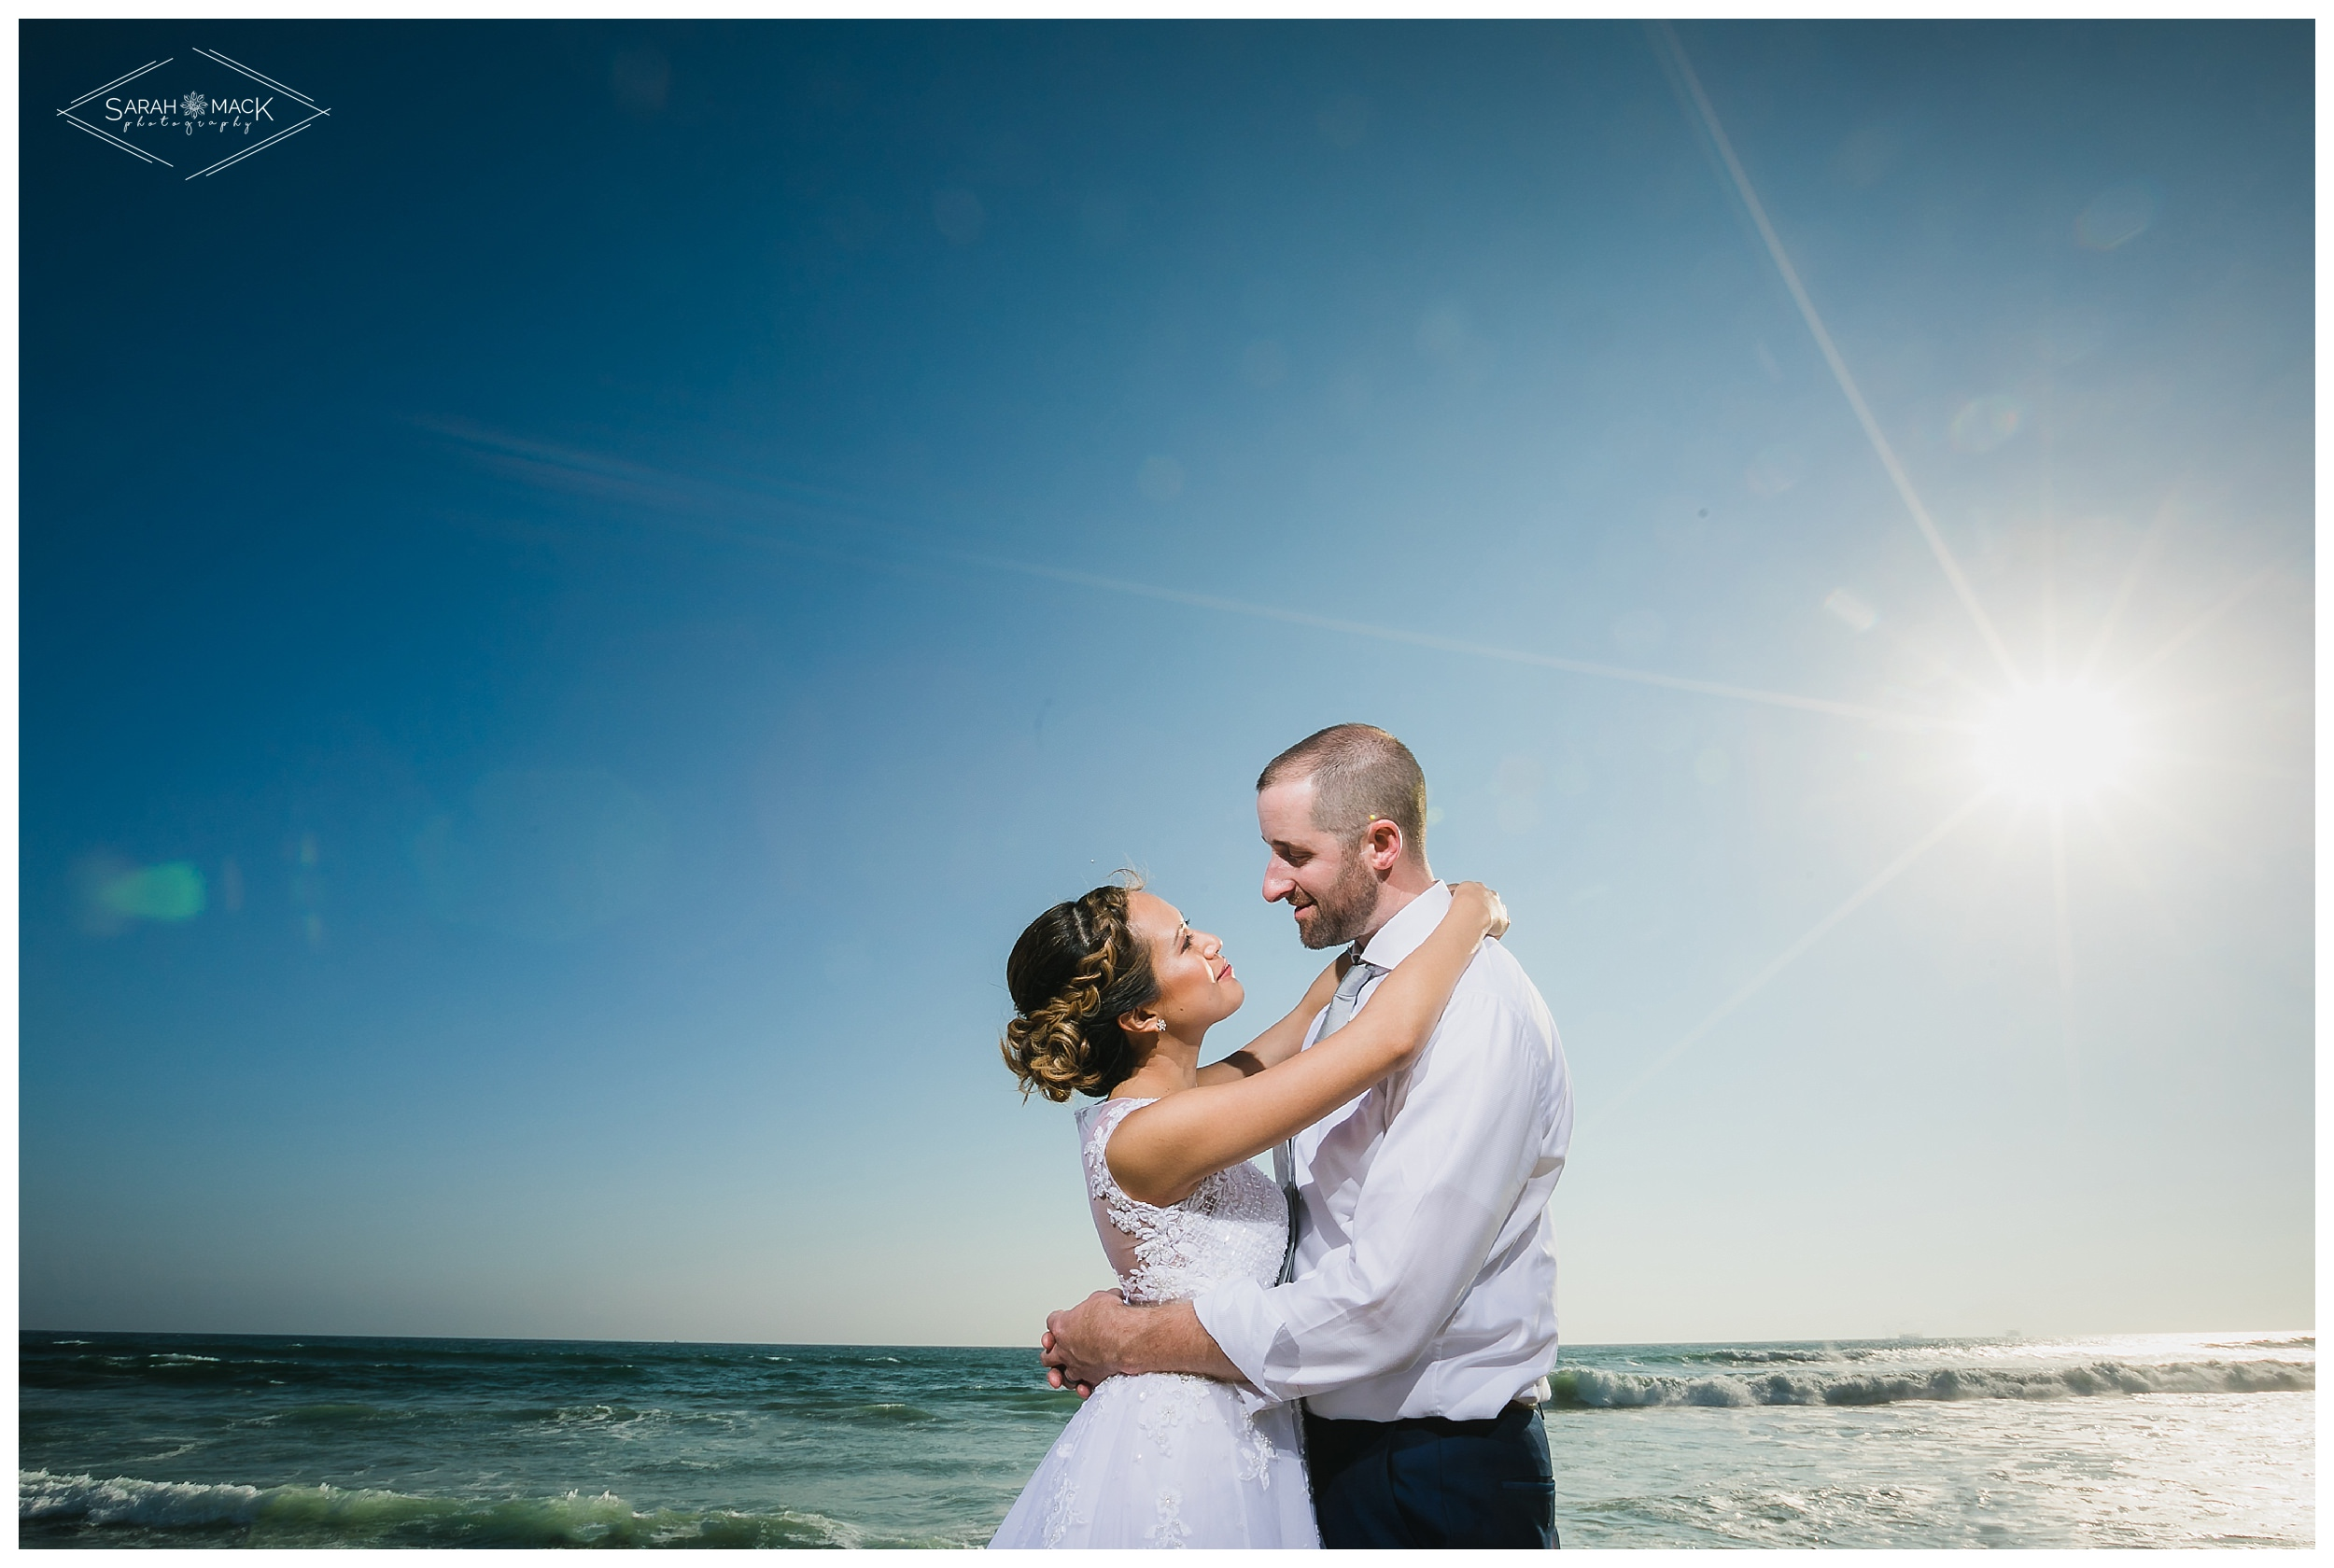 MR-Sea-Cliffe-Country-Club-Huntington-Beach-Wedding-0116.jpg